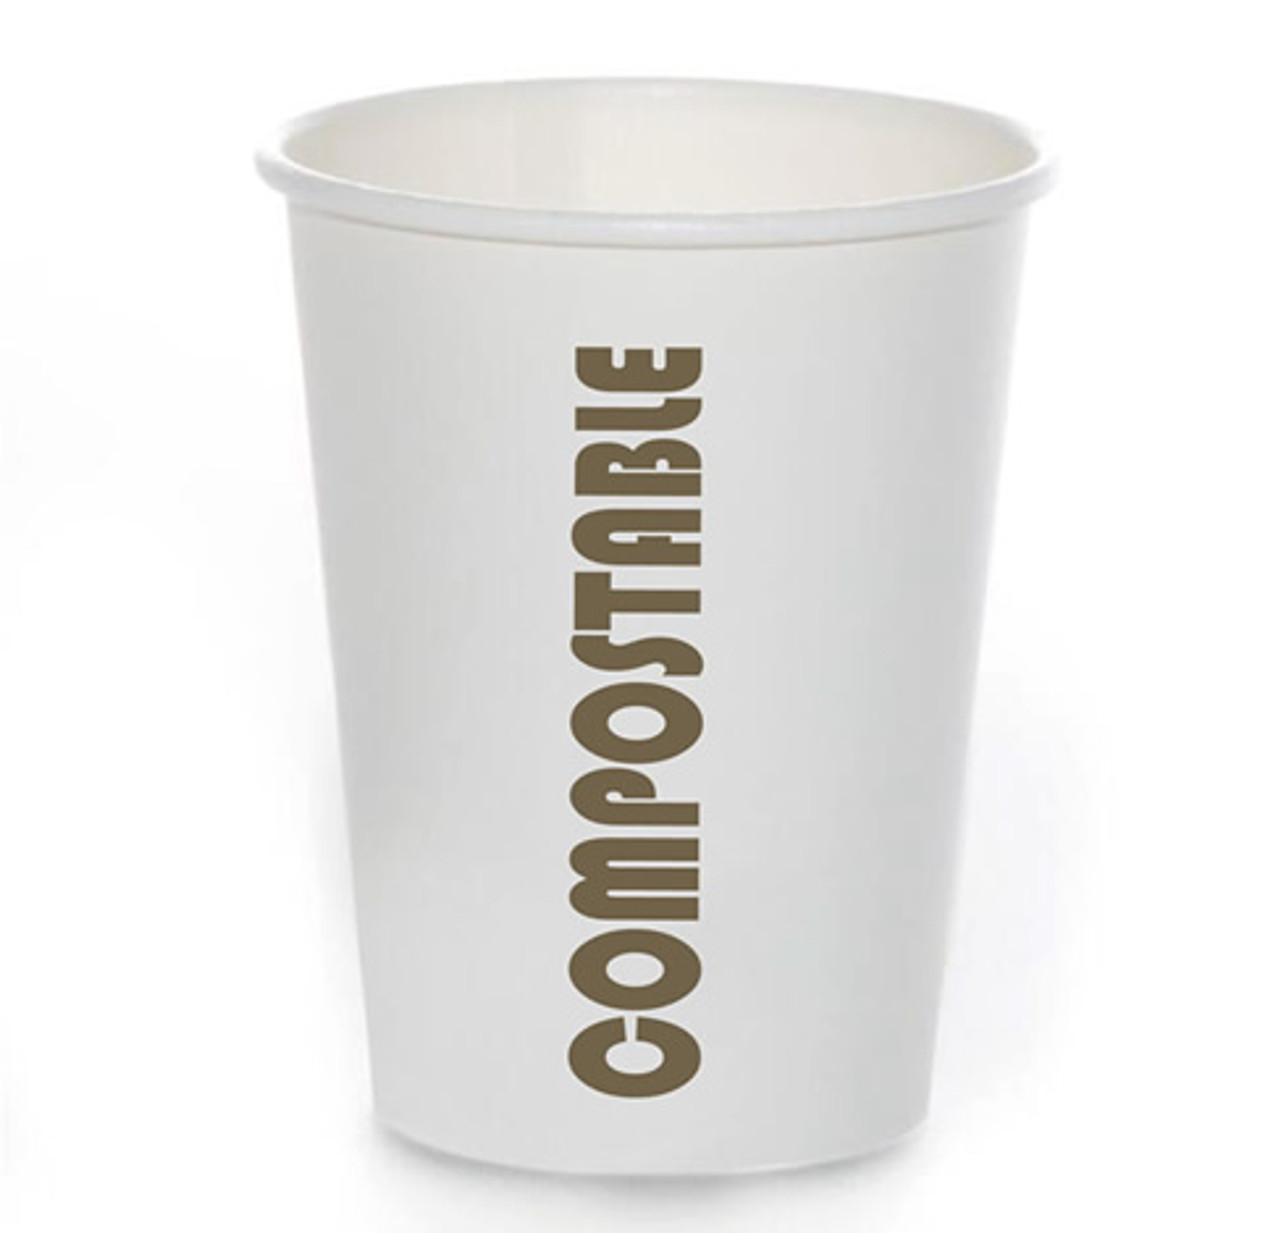 8oz Coffee Cup Compostable Print™ Series